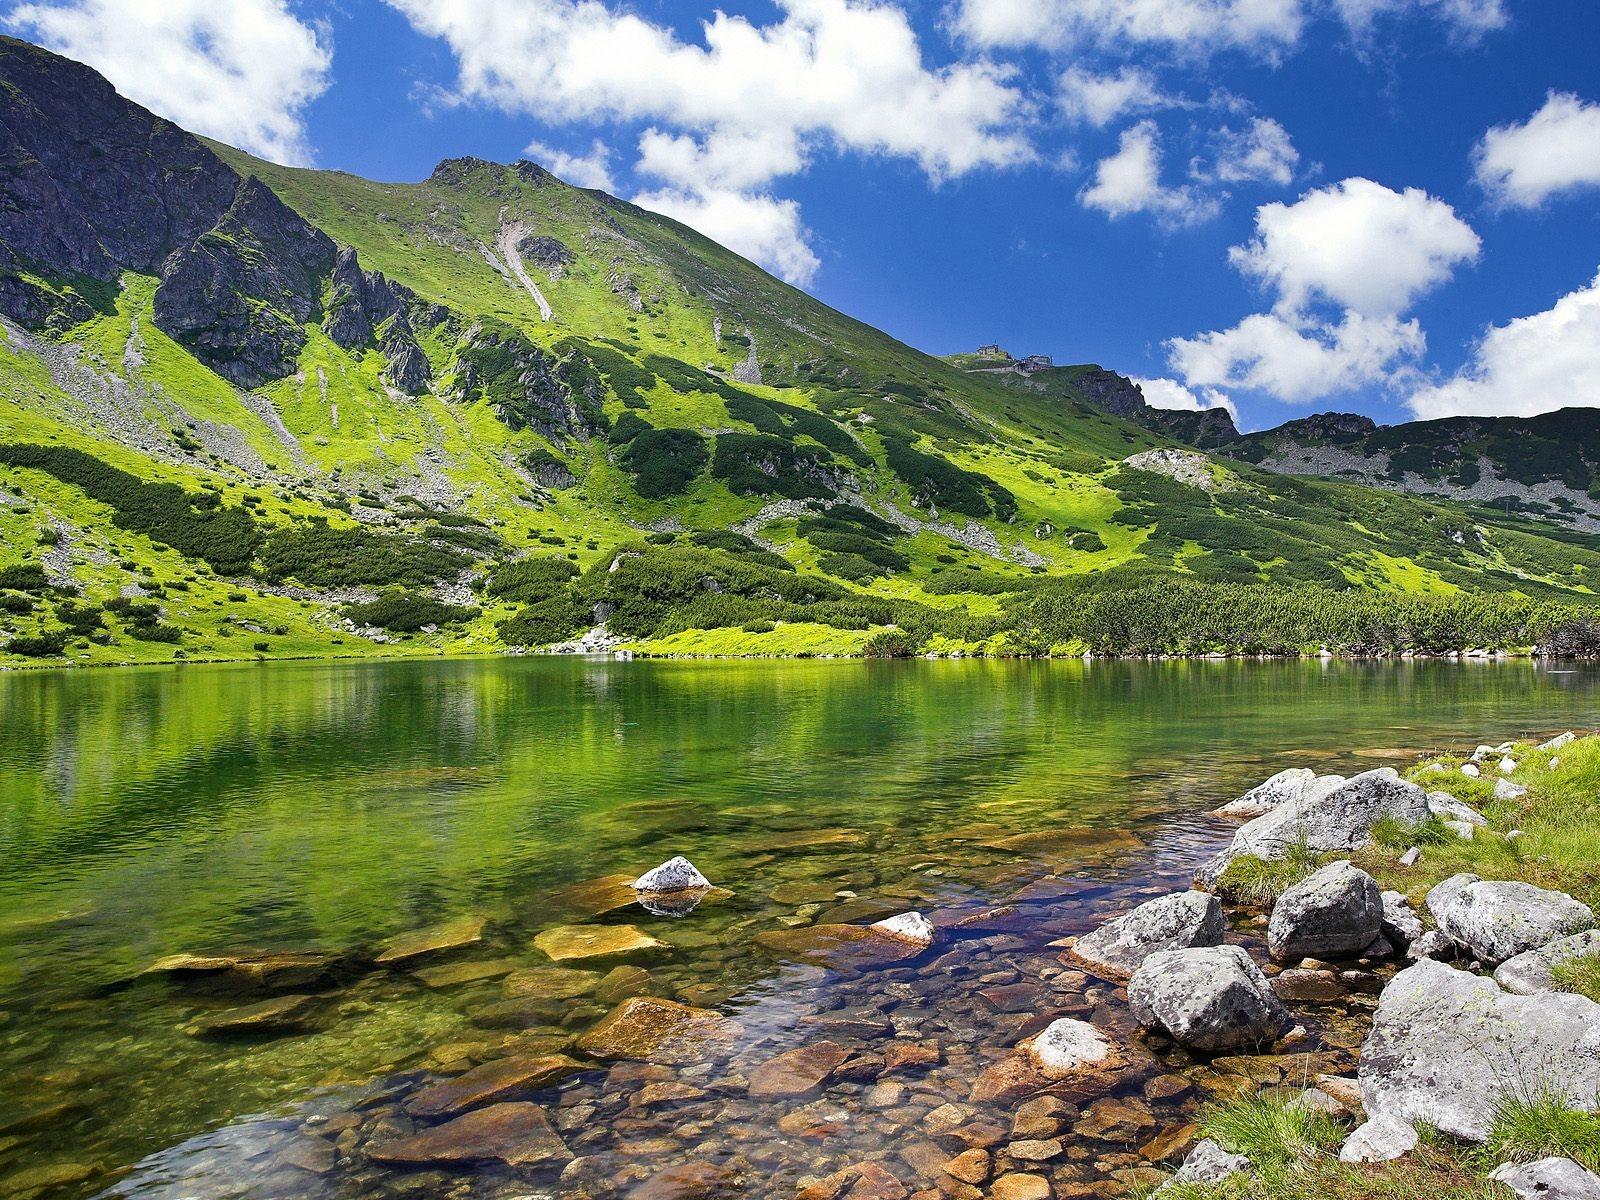 Alpine Lake Wallpaper Landscape Nature Wallpapers In Jpg